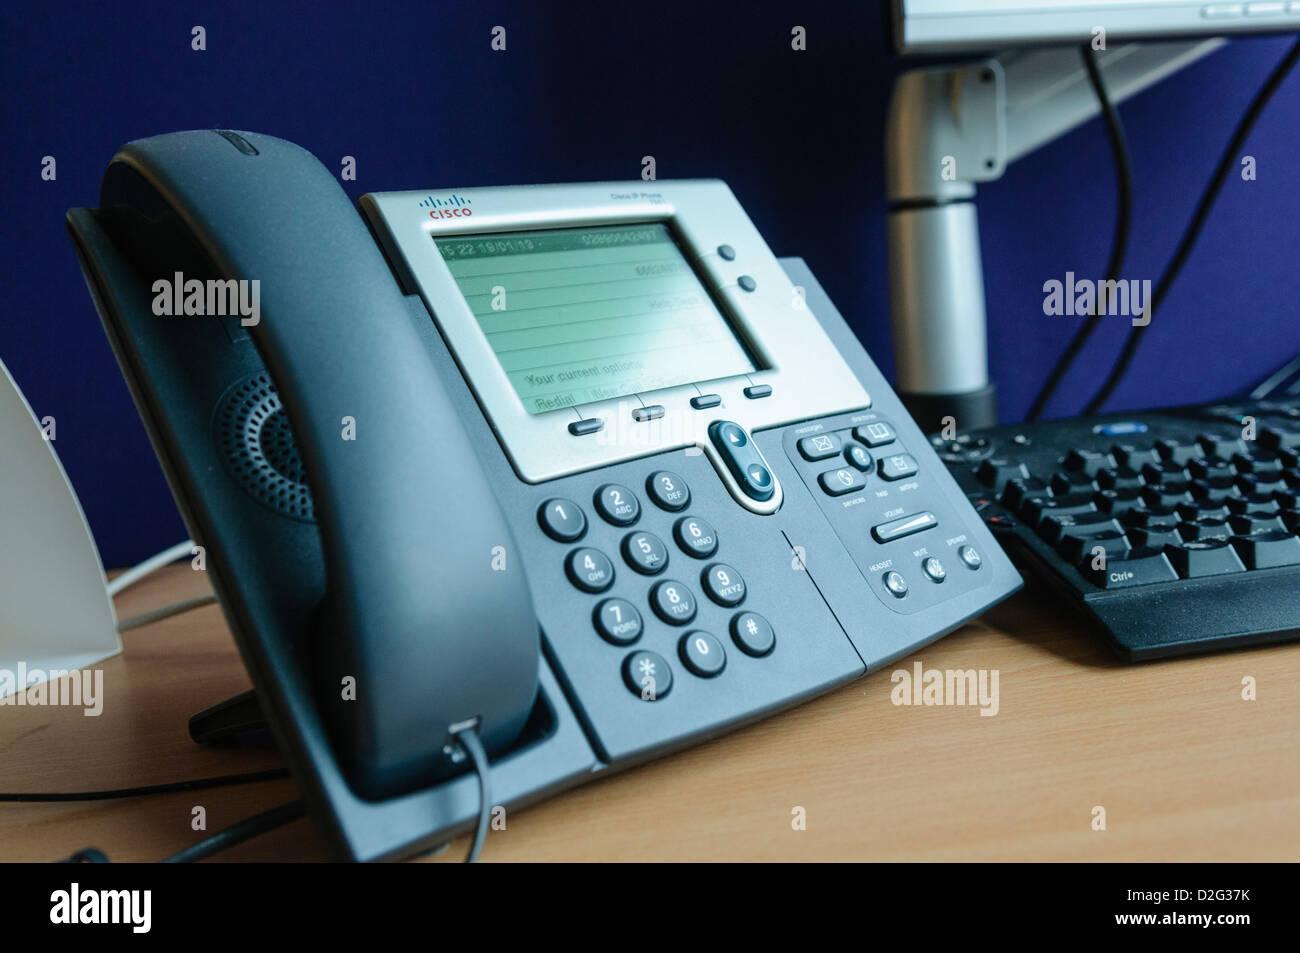 Ein Cisco IP-Telefon im Büro Stockbild